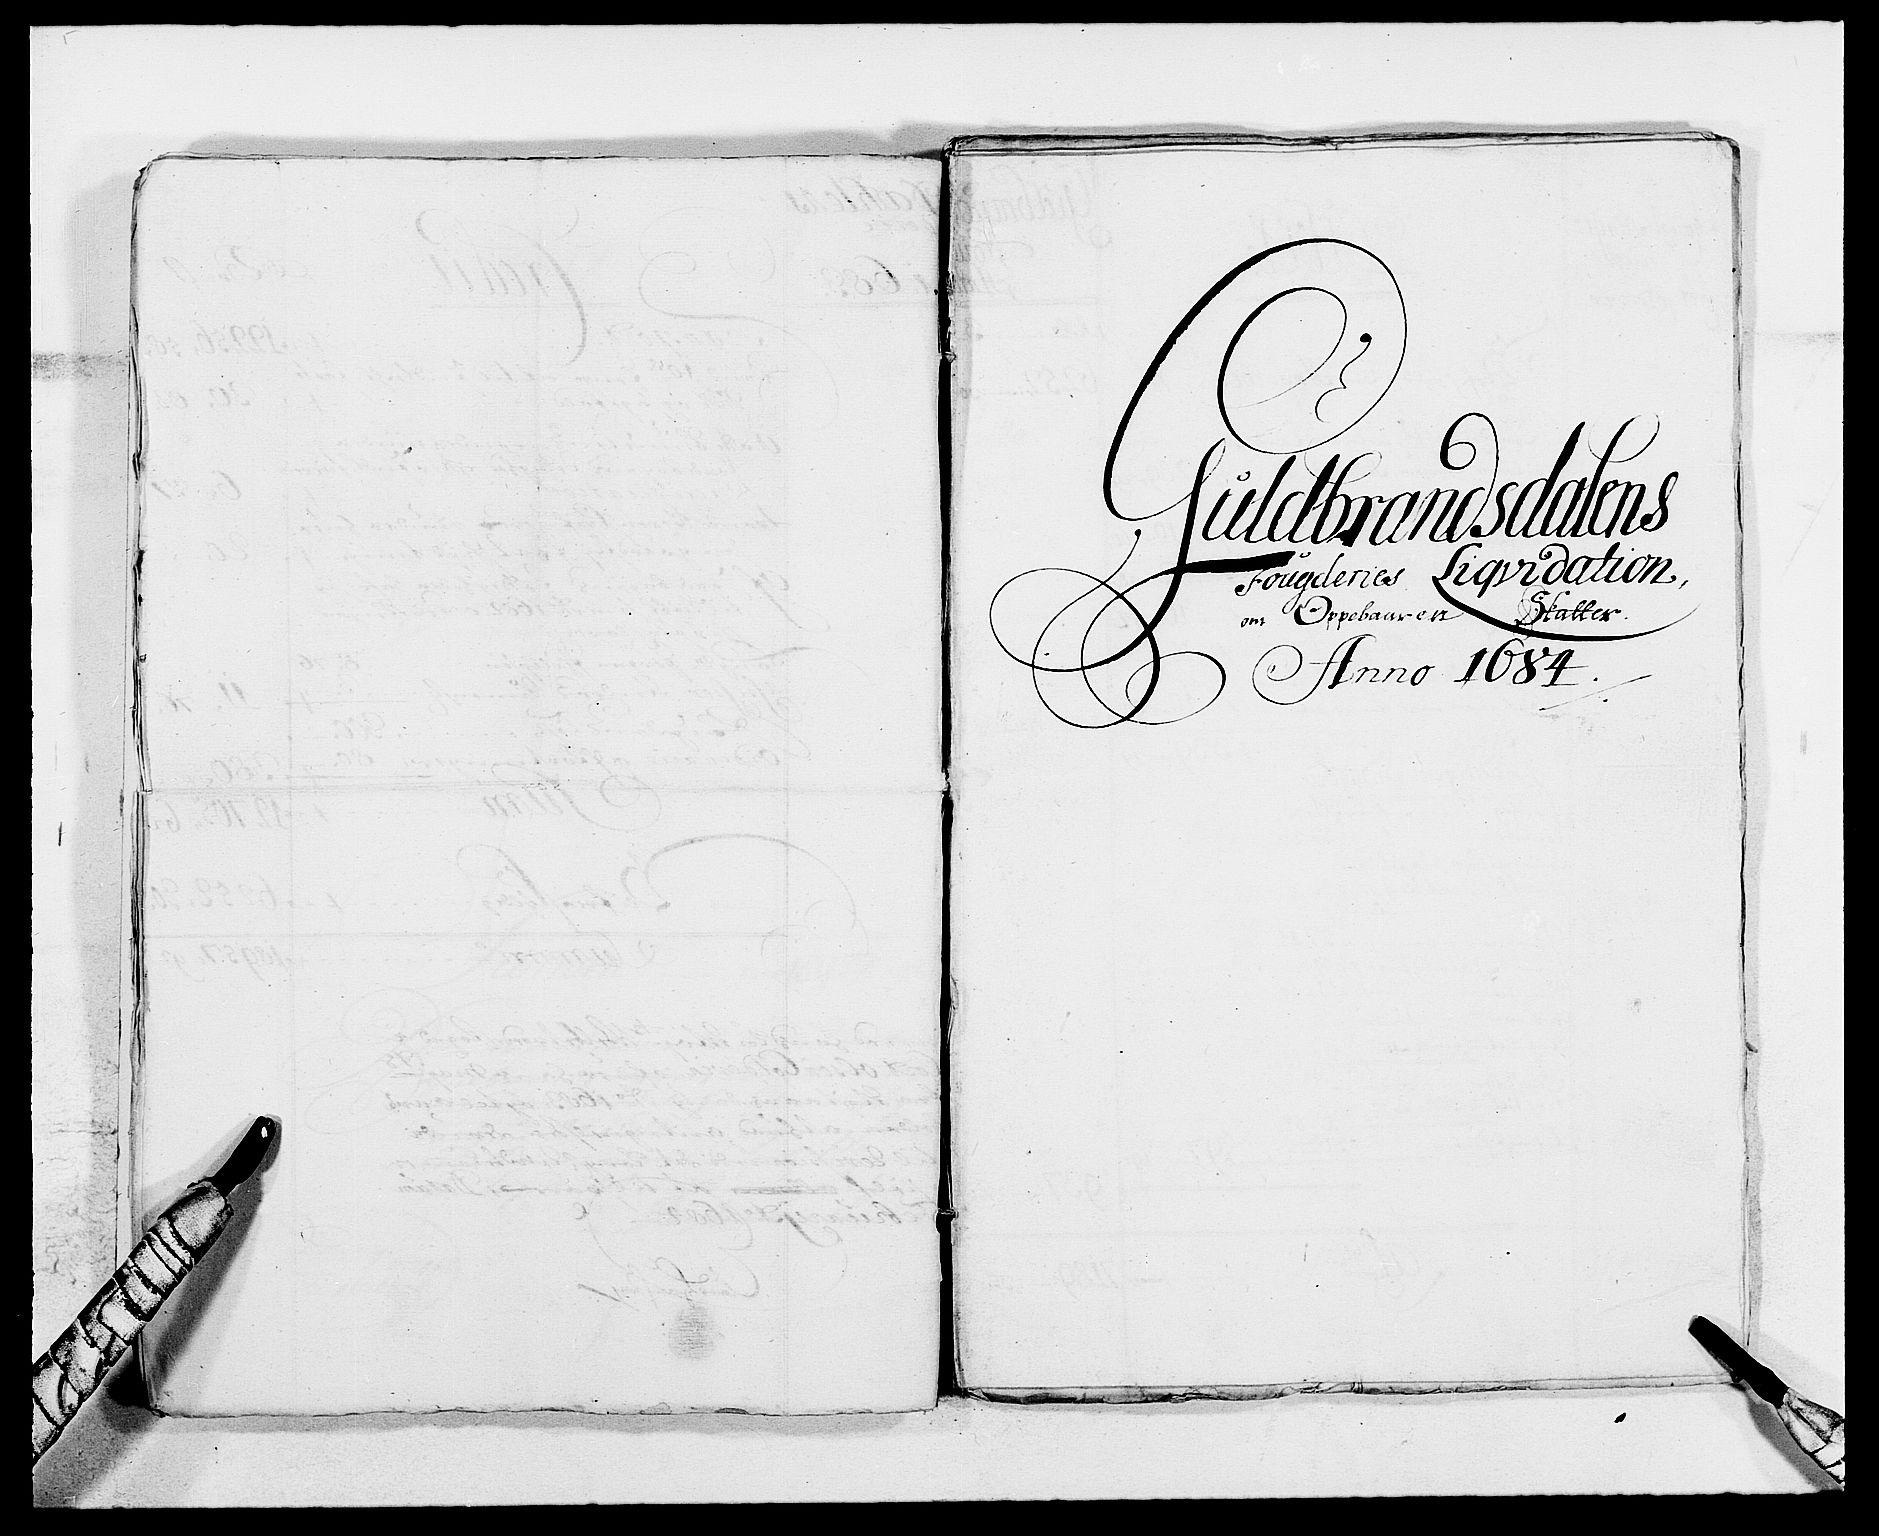 RA, Rentekammeret inntil 1814, Reviderte regnskaper, Fogderegnskap, R17/L1157: Fogderegnskap Gudbrandsdal, 1682-1689, s. 12